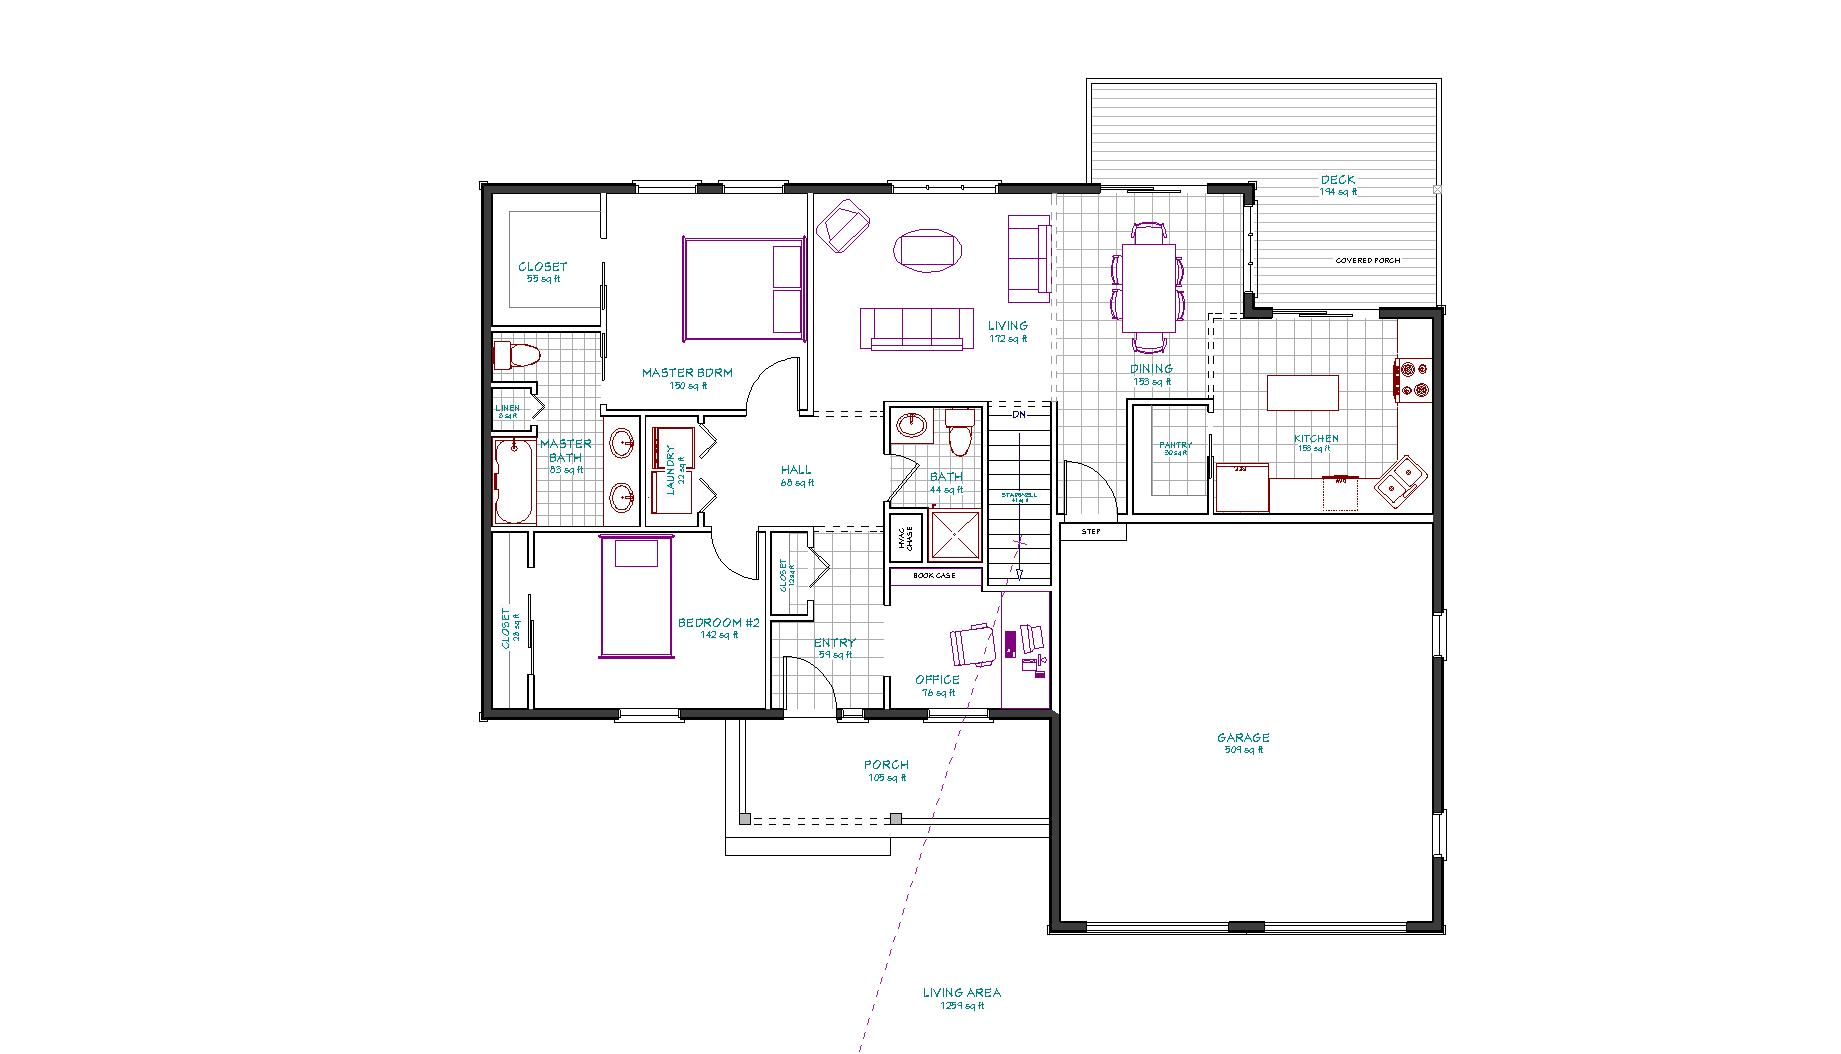 Pleasant 1100 Square Foot House Plans With Loft 1100 House Plans Designs Largest Home Design Picture Inspirations Pitcheantrous